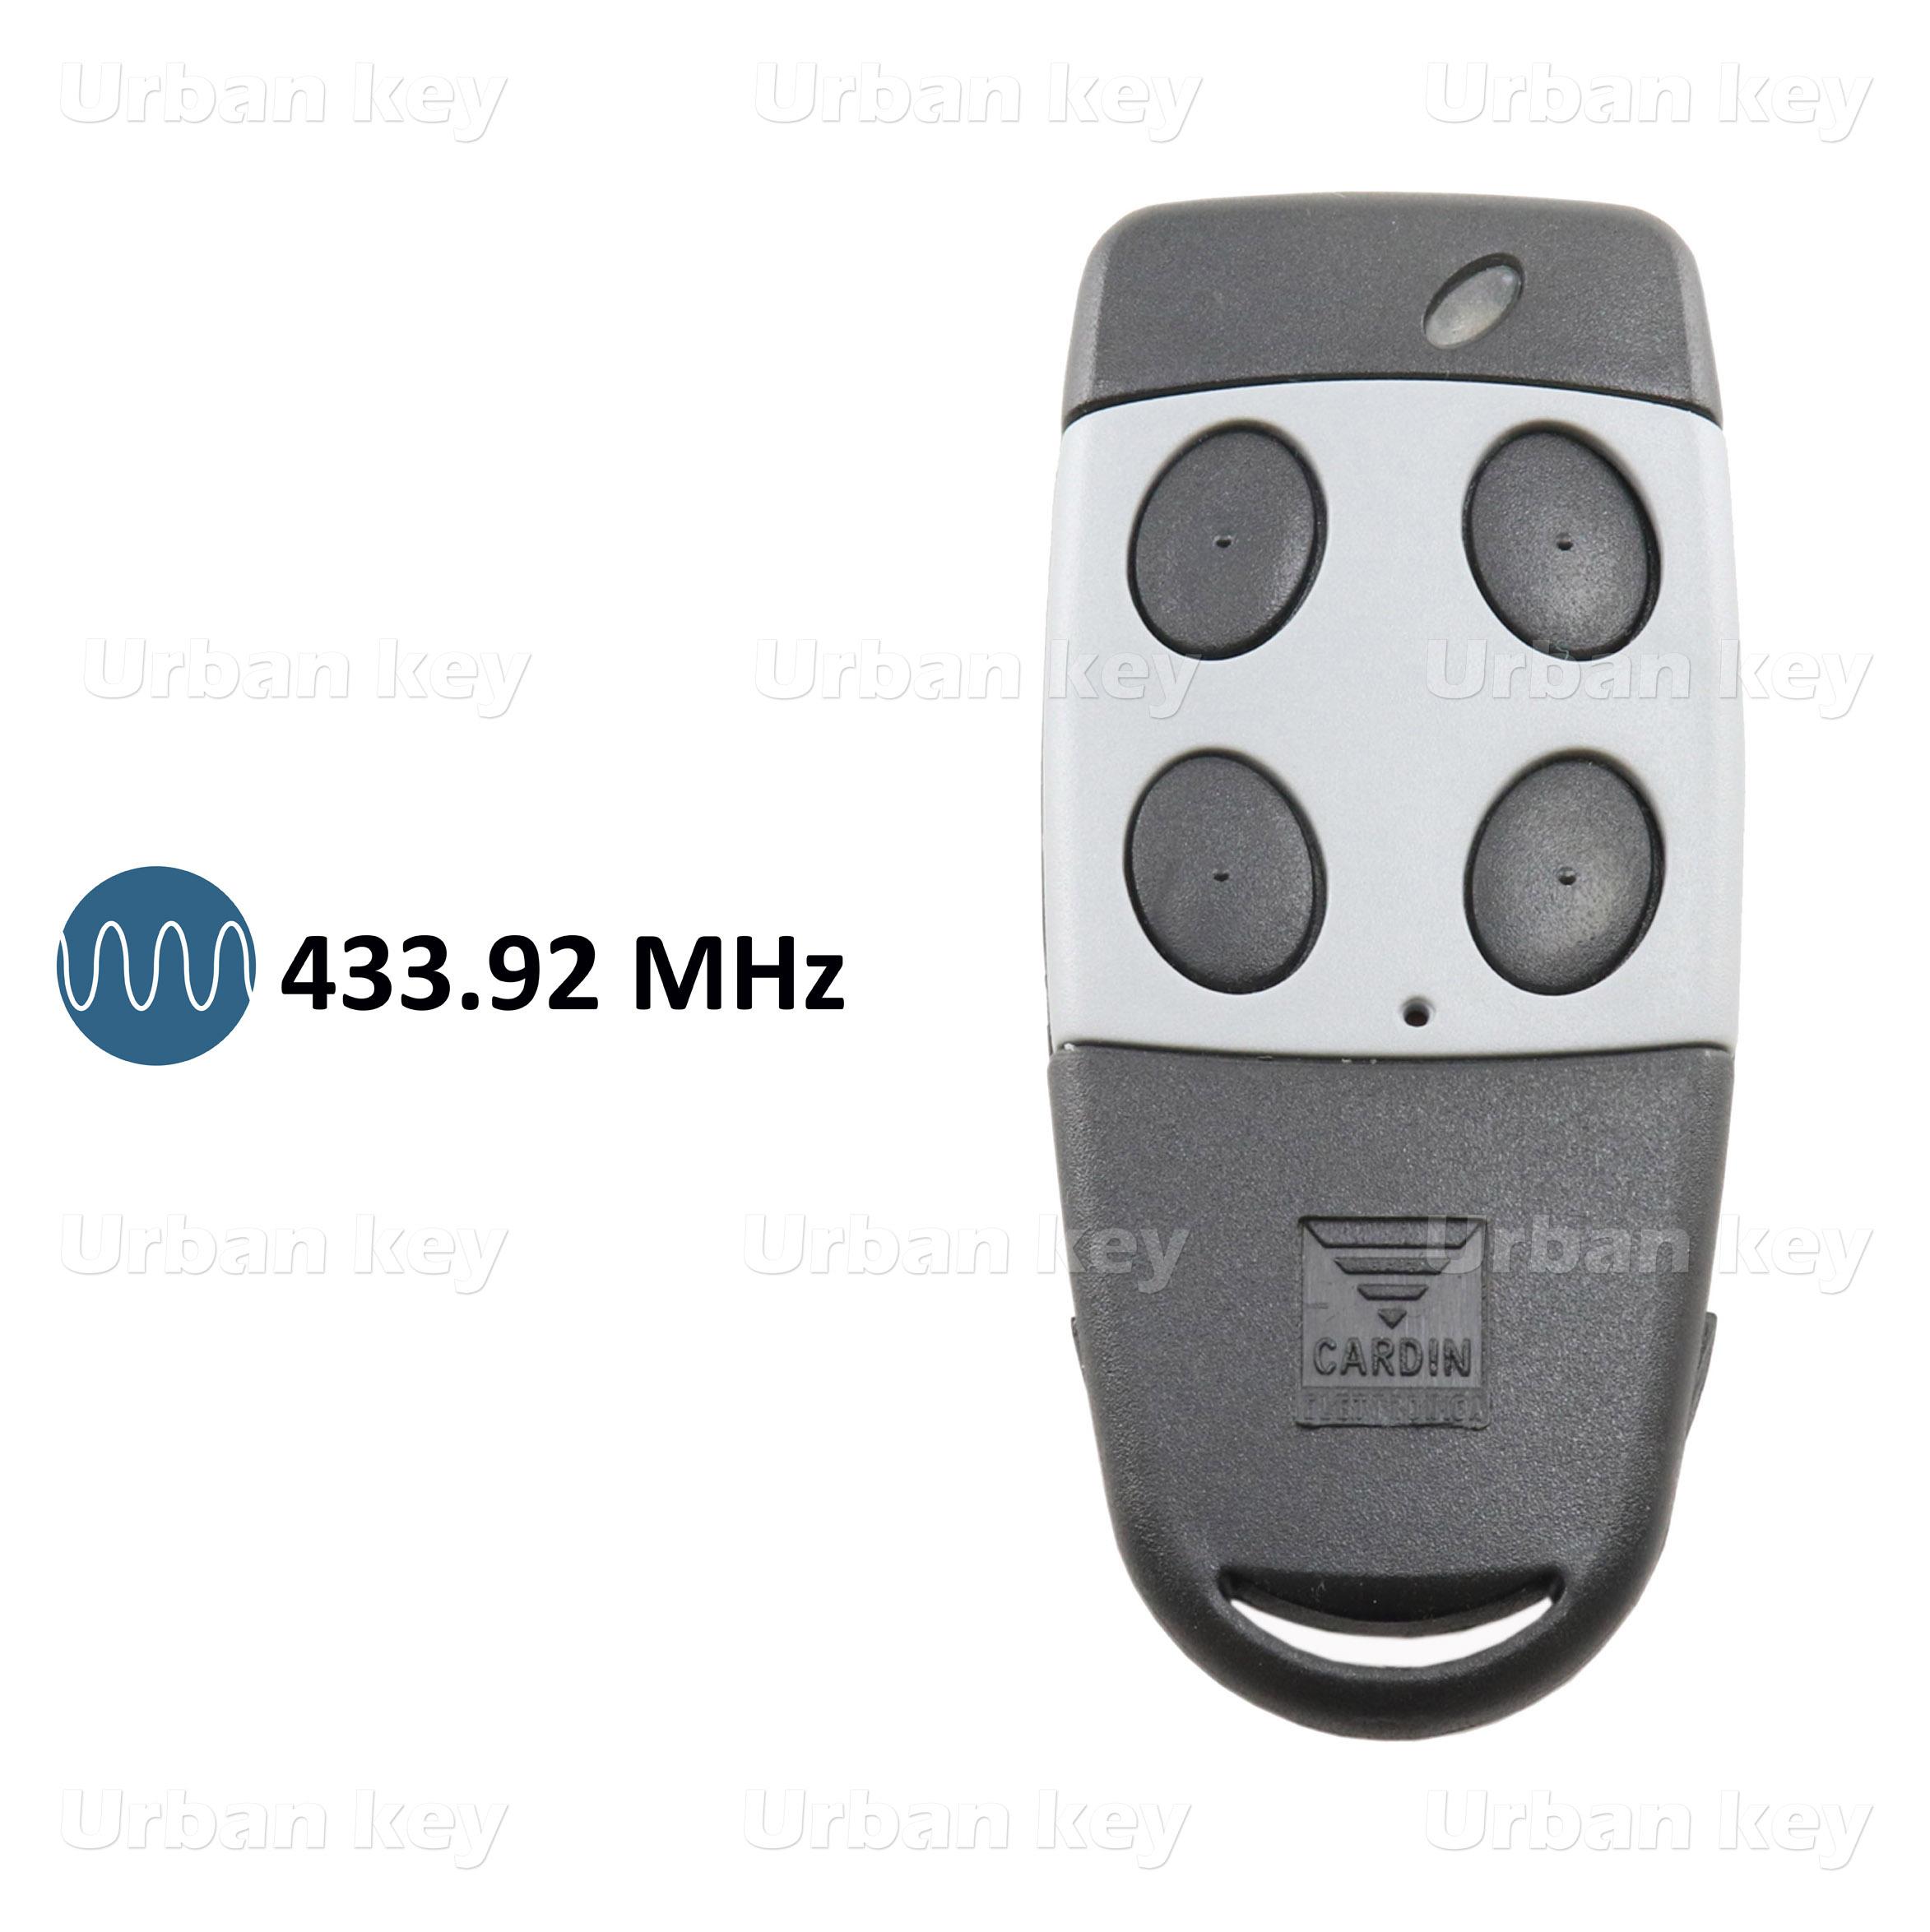 EMISSOR CARDIN S449 QZ4 433 MHz 4 CANAIS